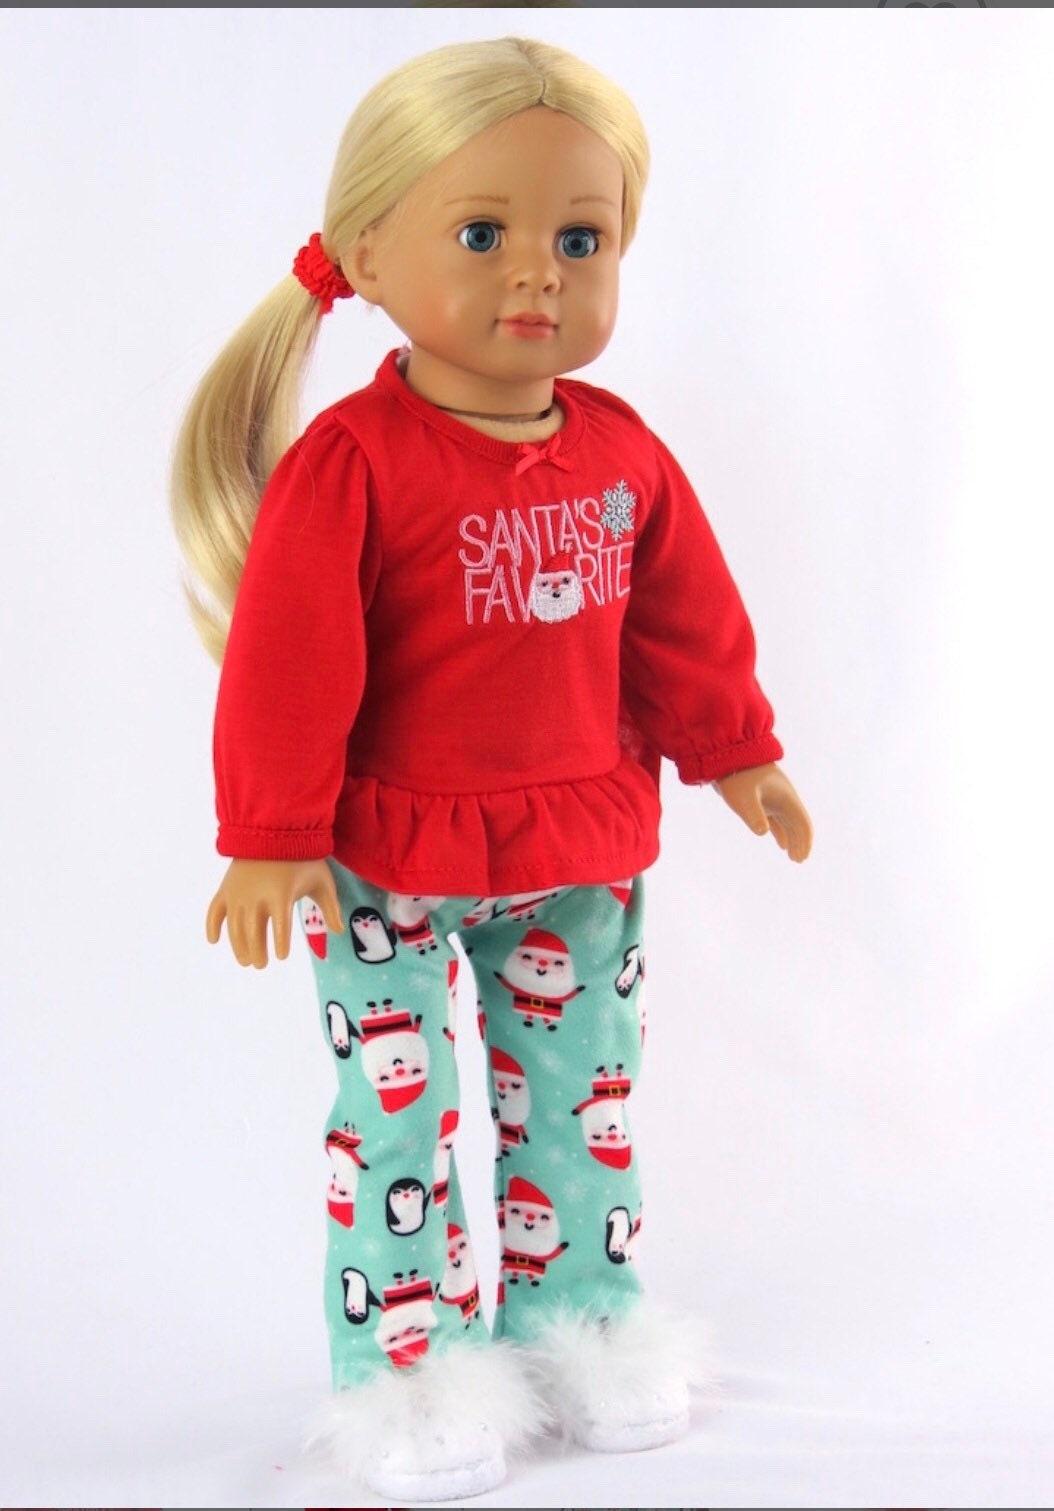 USA Gymnastics Leotard /& Flag Set Fits 14.5 Wellie Wishers American Girl Clothes